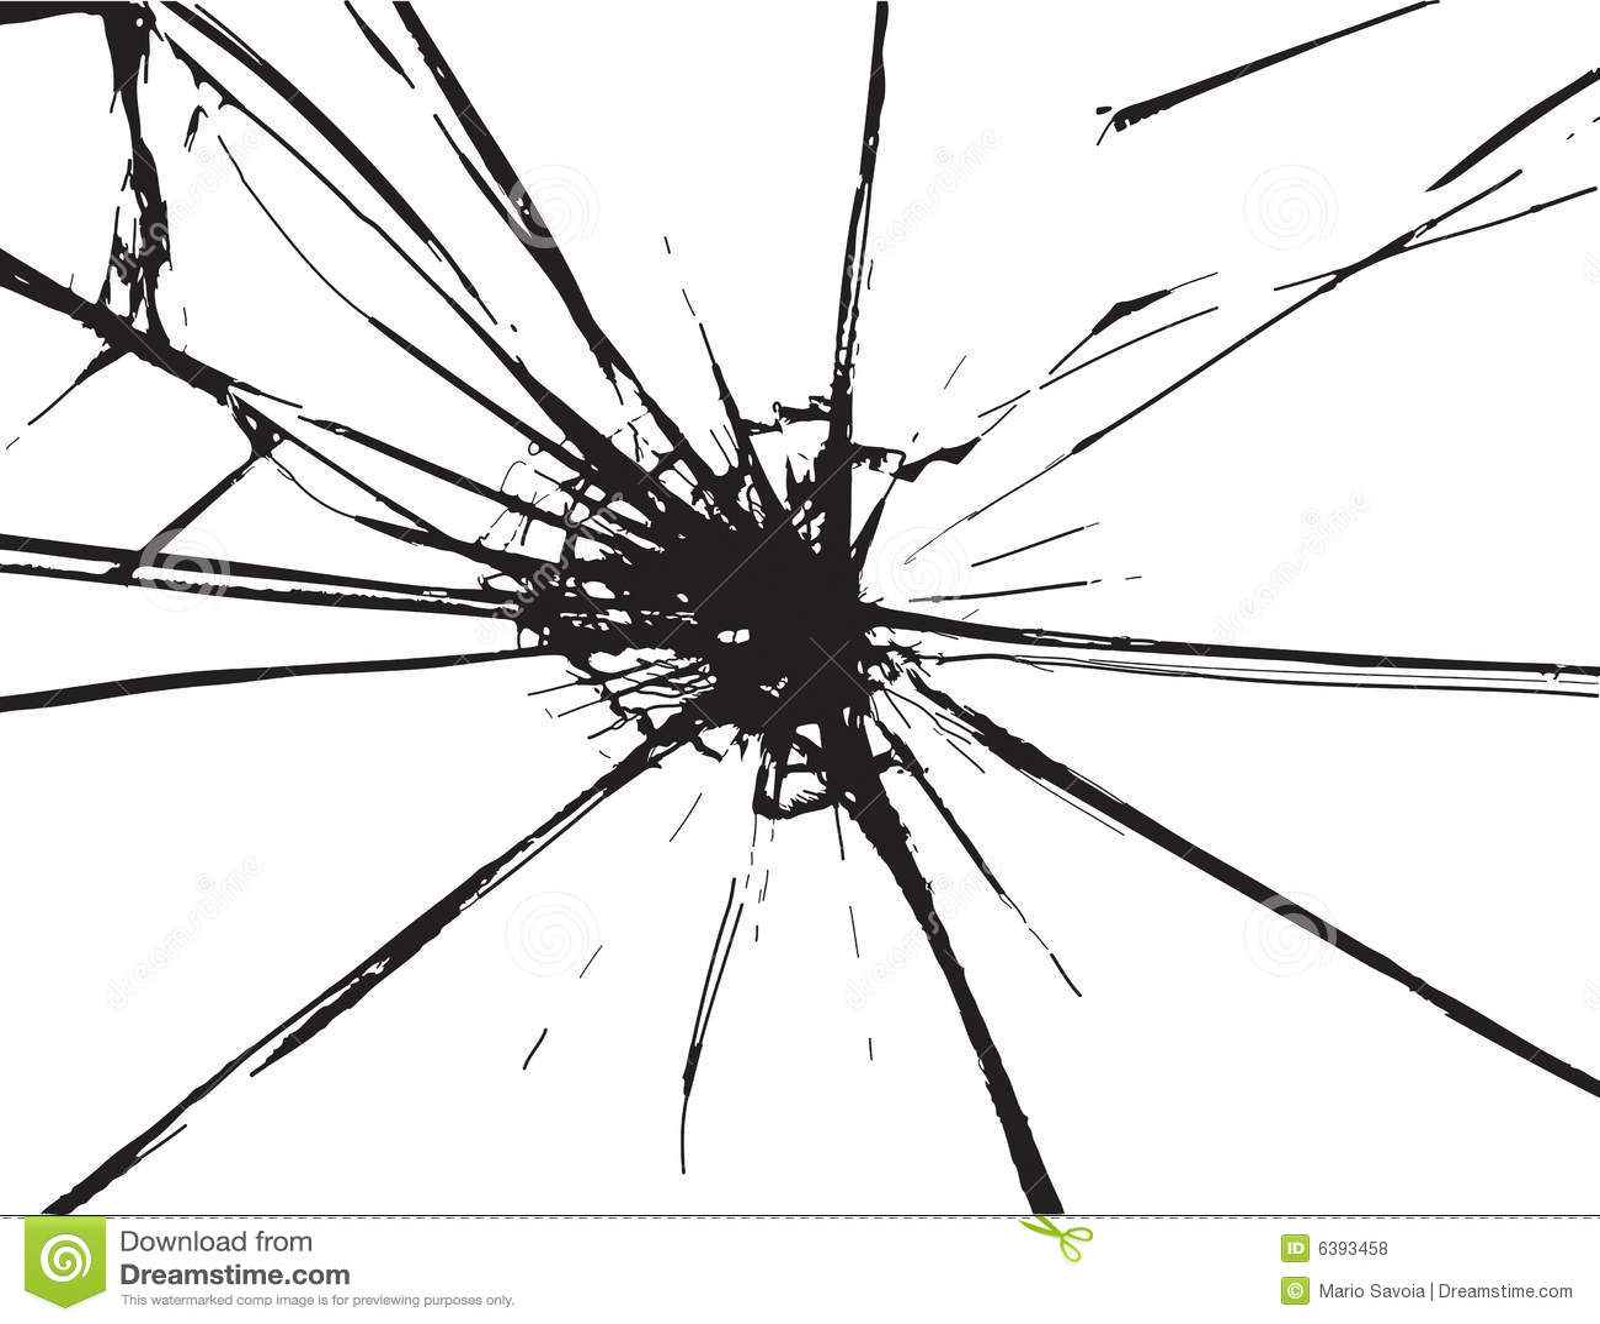 Broken Glass Royalty Free Stock Photos Image 6393458